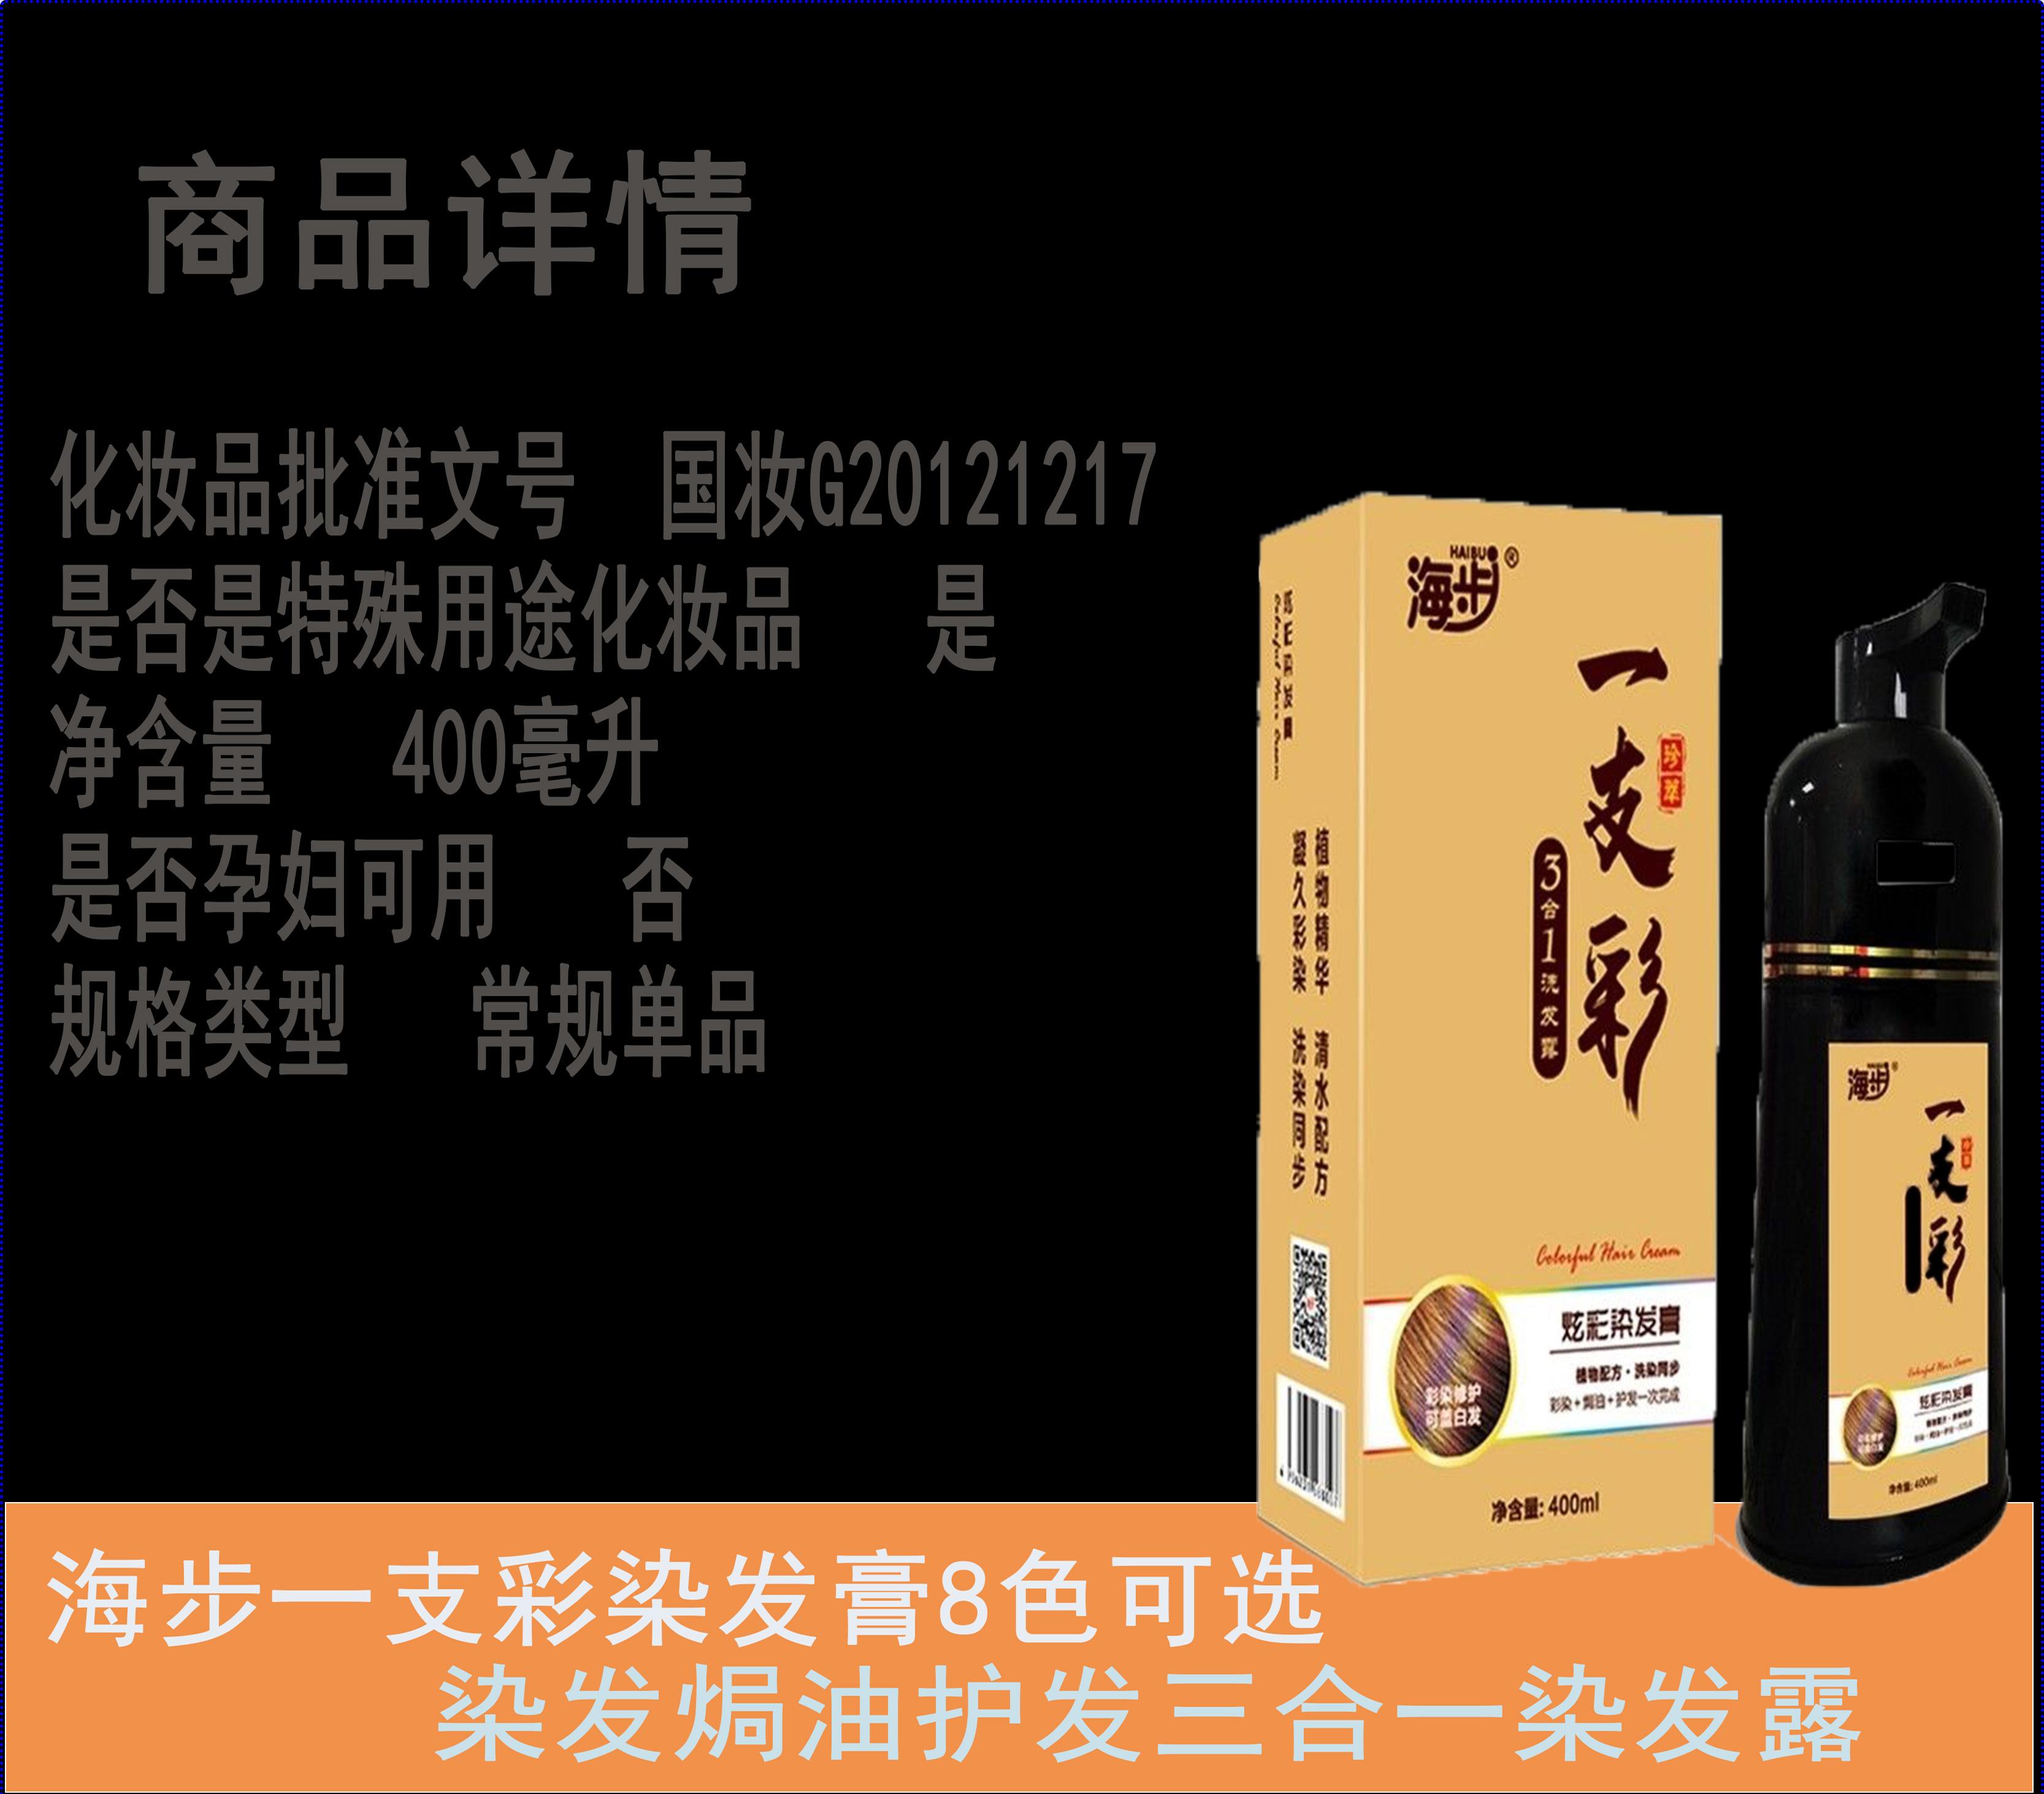 https://xiaoba.shall-buy.com/attachment/images/16753/2019/06/Y8BEMLq8MzyEK5EsslKq8p65QYqp8Y.jpg